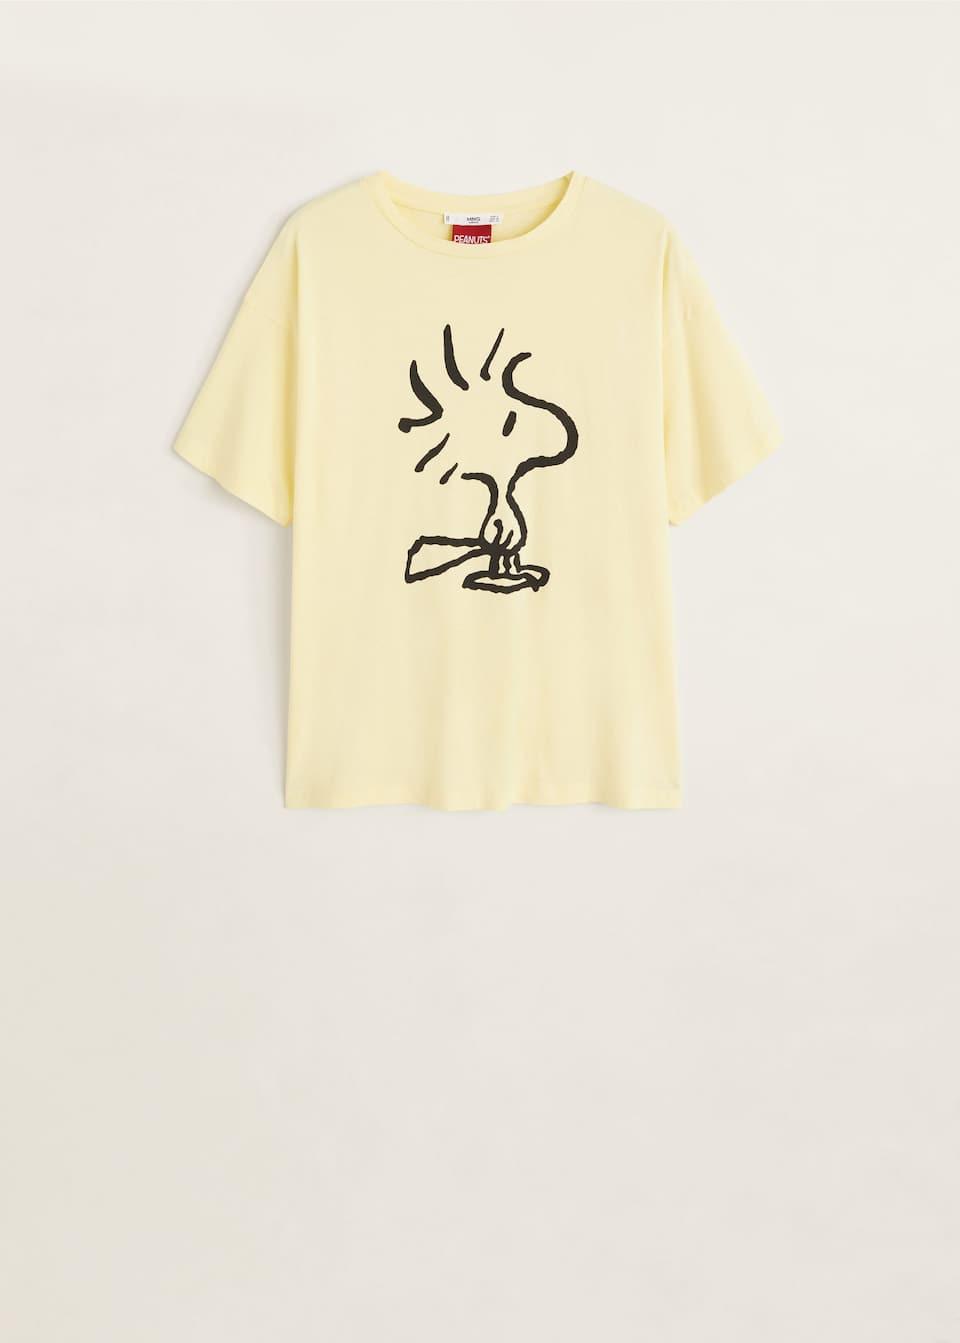 new style 0e3b9 e2b6b T-shirt peanuts - Damen | Mango Deutschland